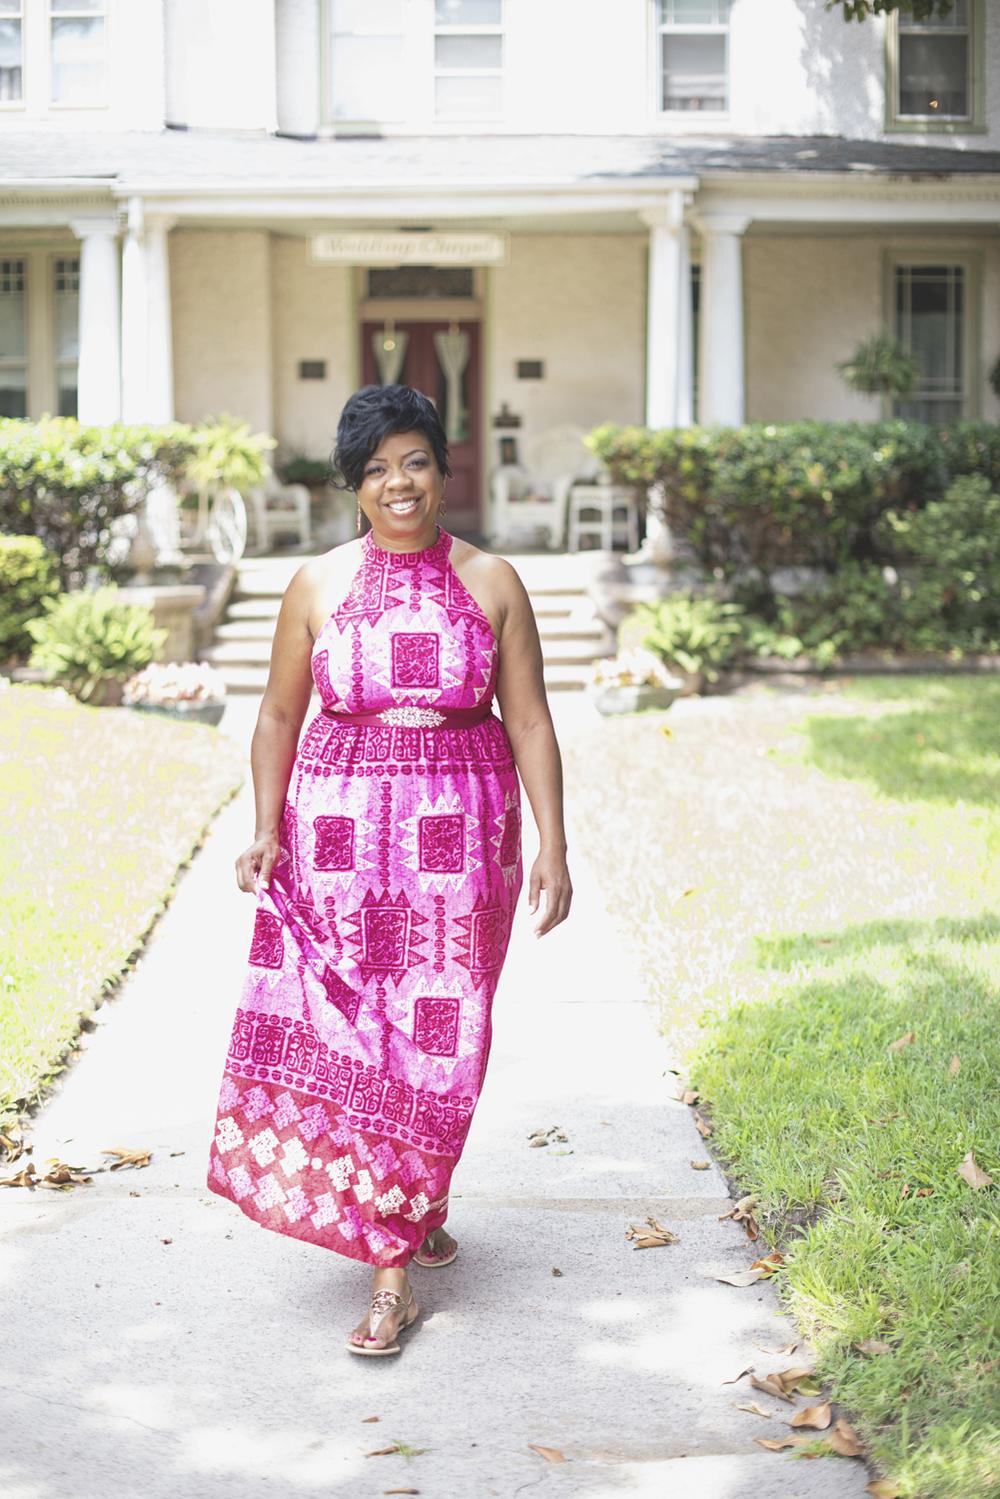 Magnolia House Inn Elopement | Hampton, Virginia Wedding Photographer | Bridal portraits in pink Hawaiian dress